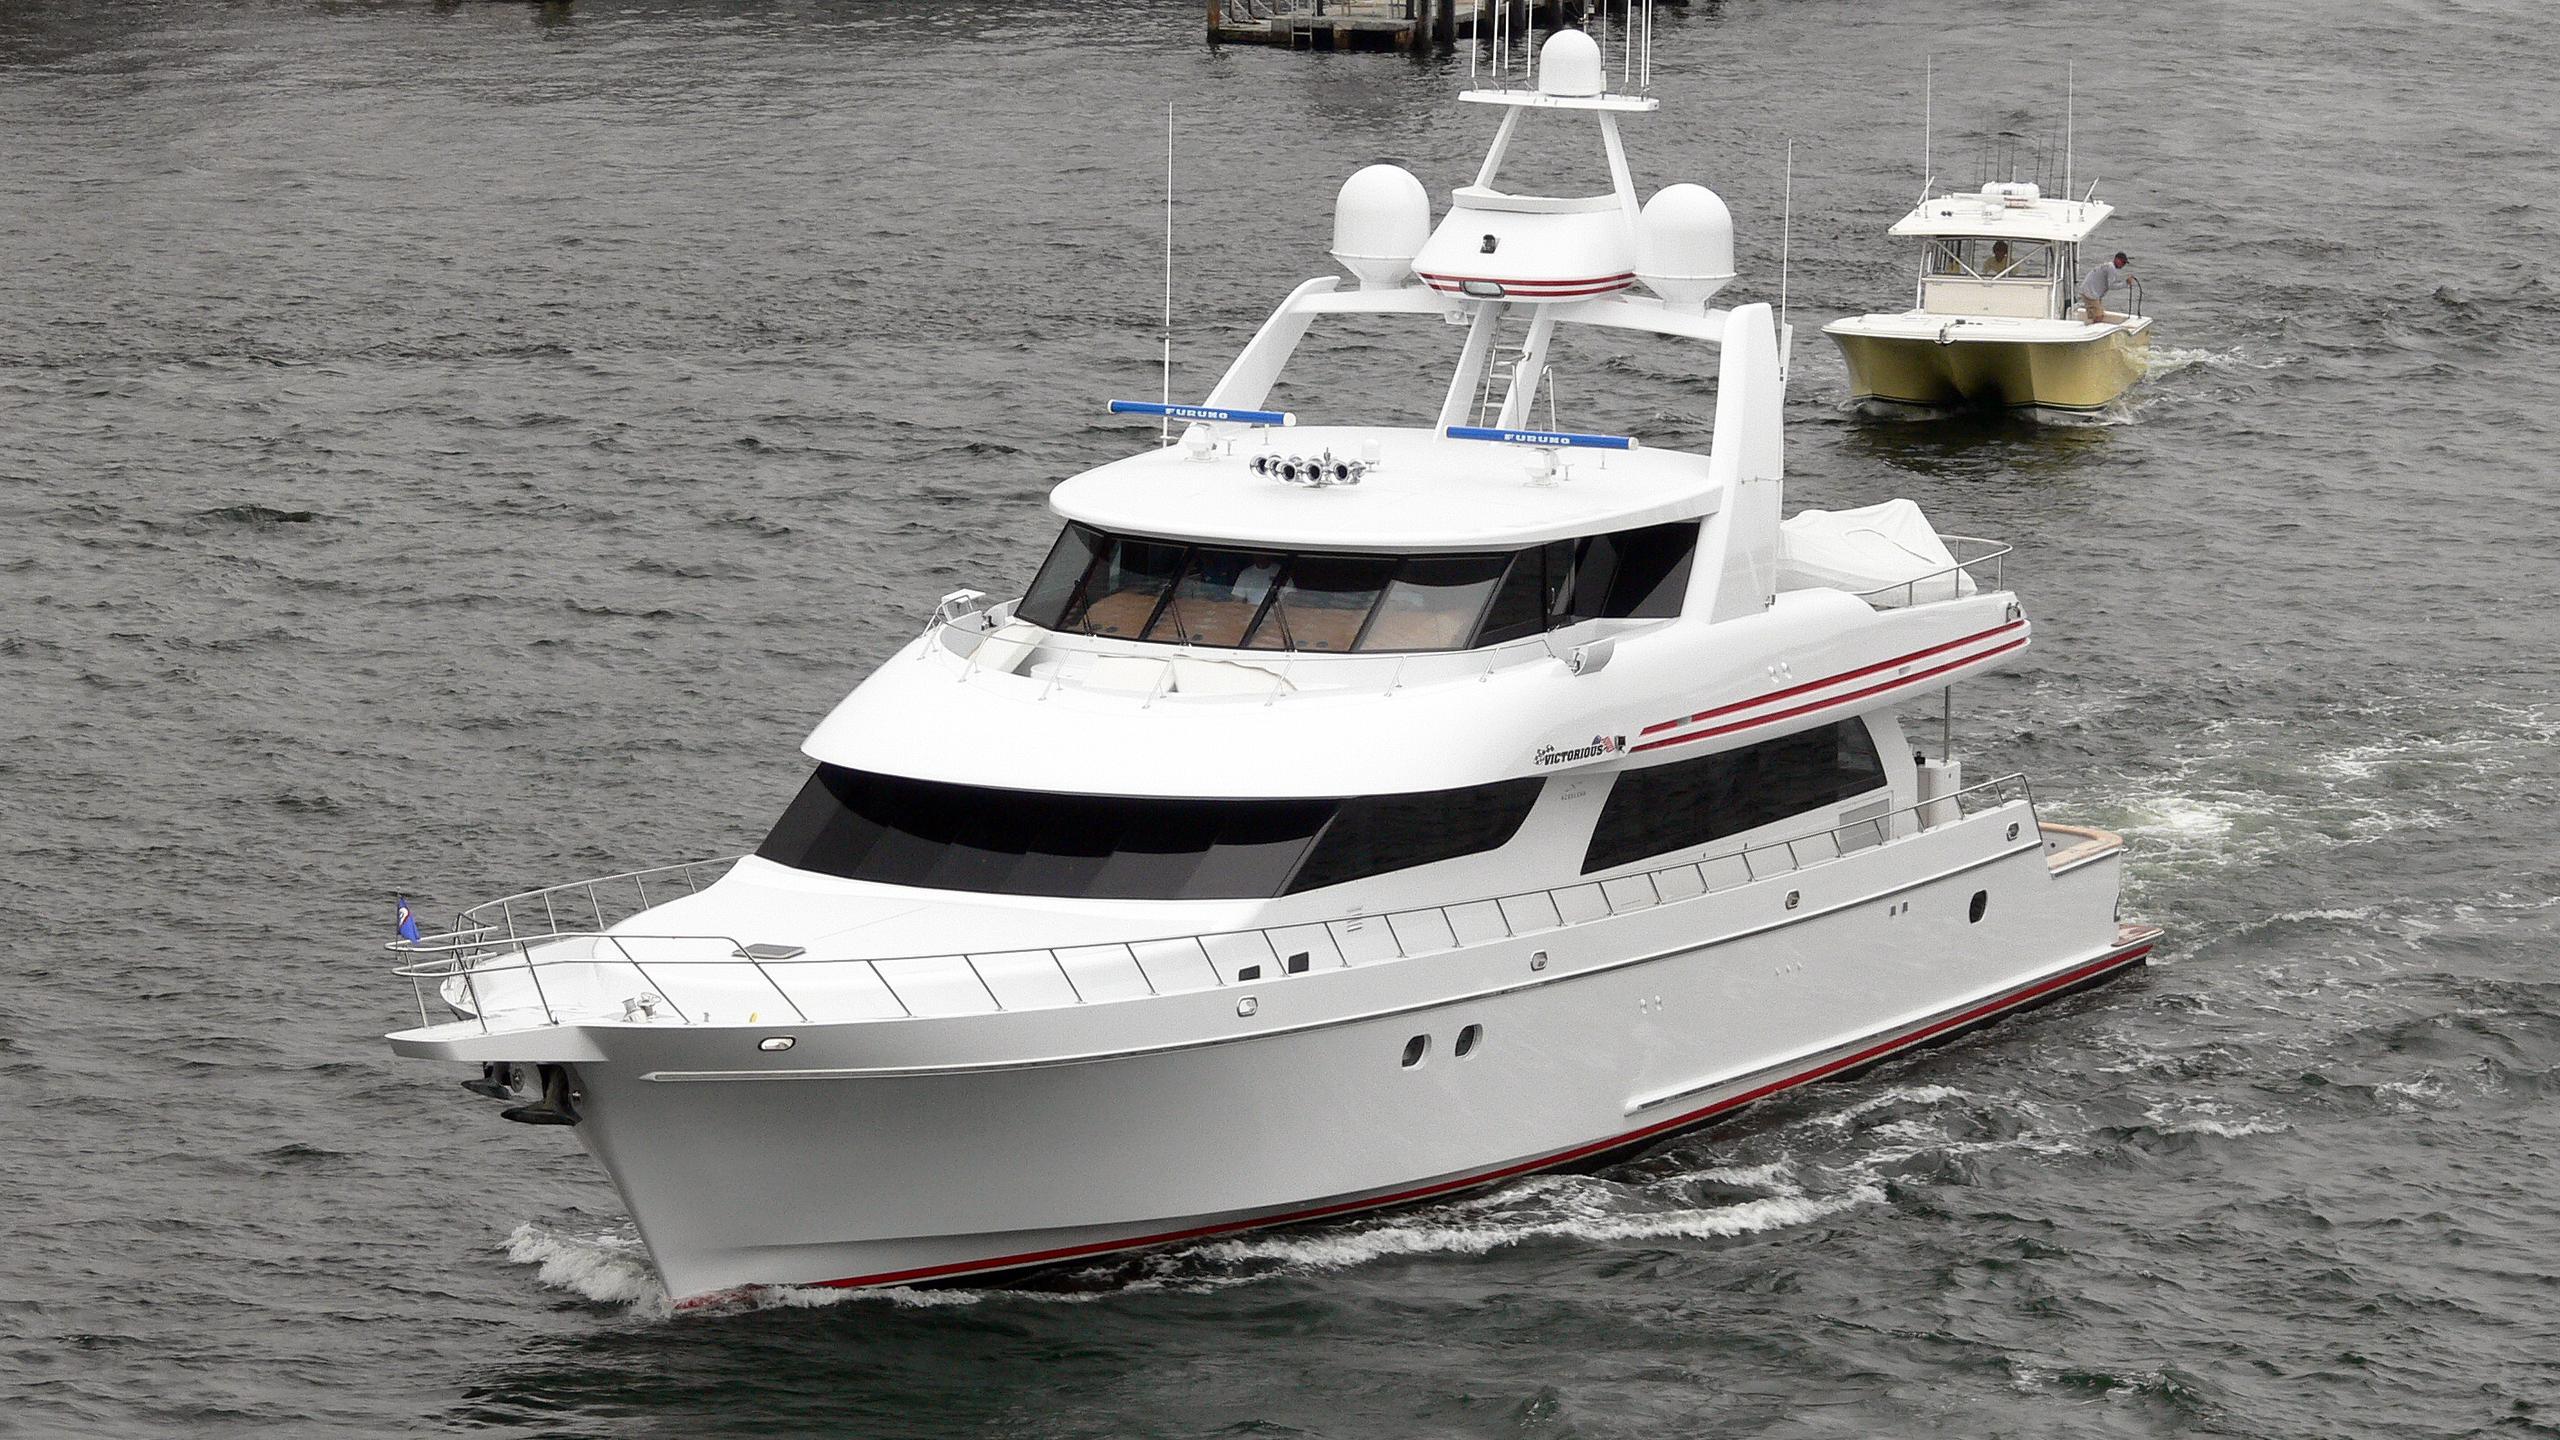 victorious-motor-yacht-nordlund-2006-34m-cruising